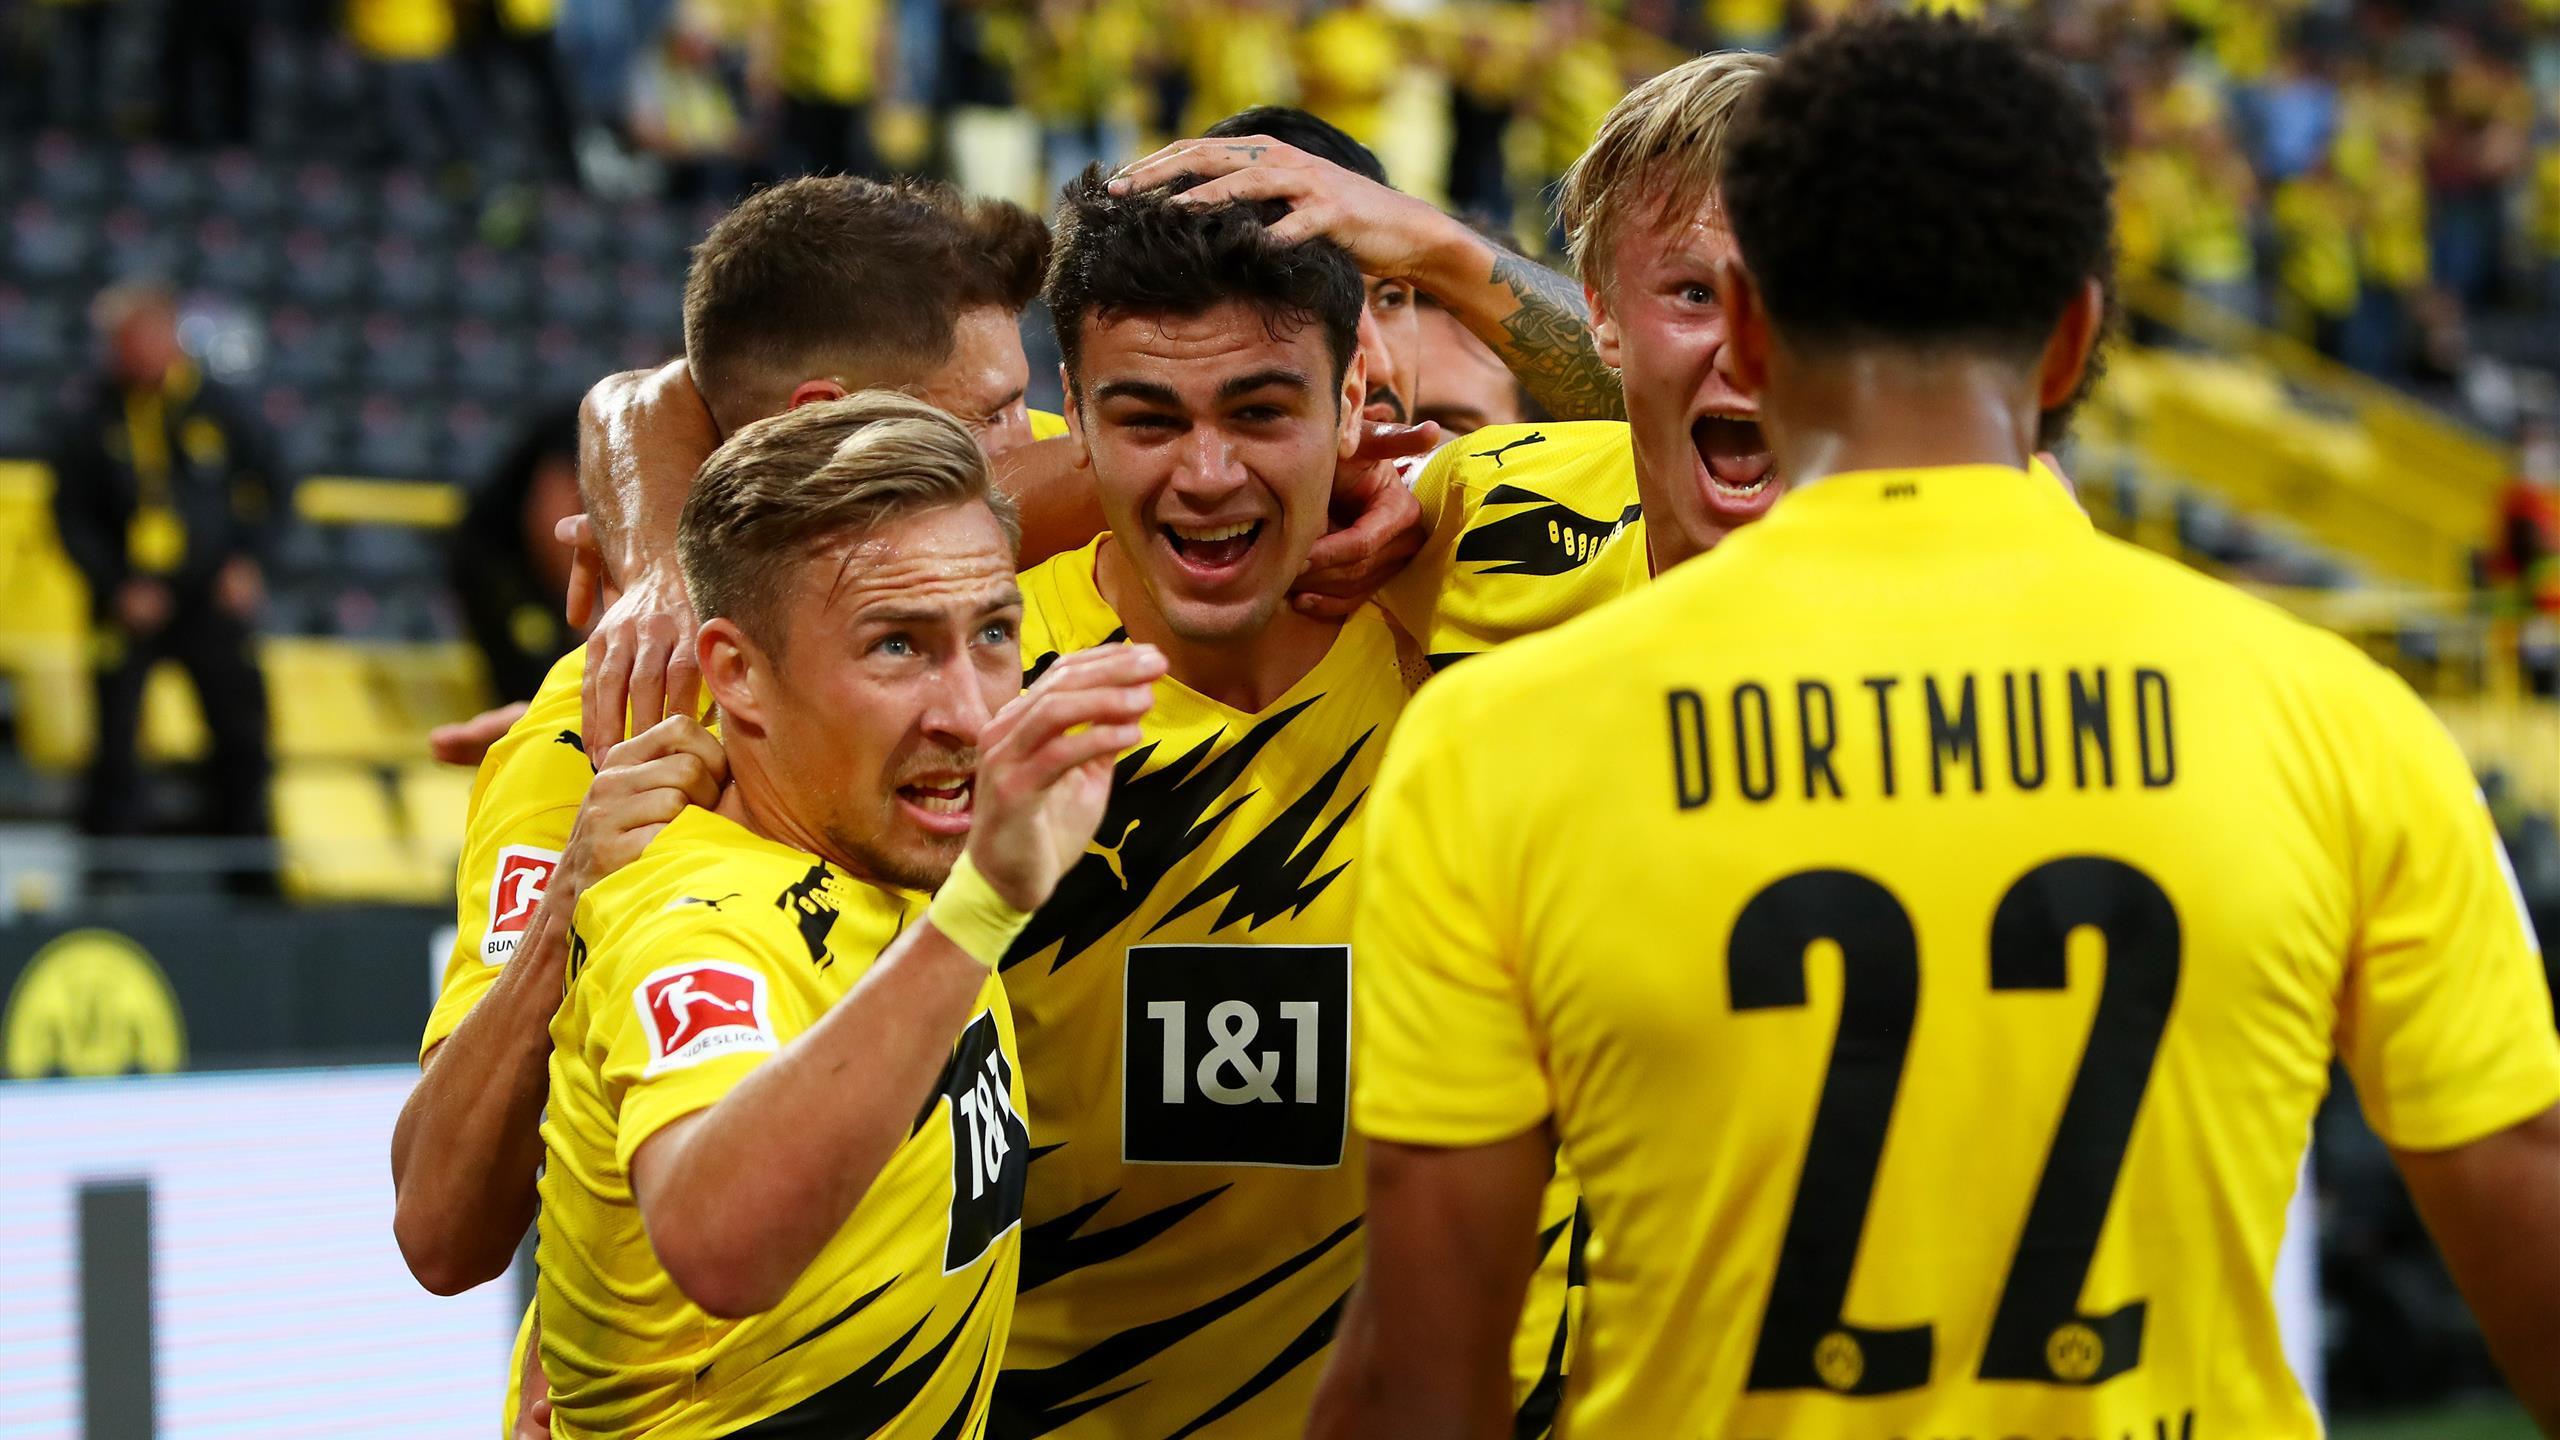 Erling Haaland Brace Crowns Borussia Dortmund Win Over Borussia Monchengladbach Eurosport